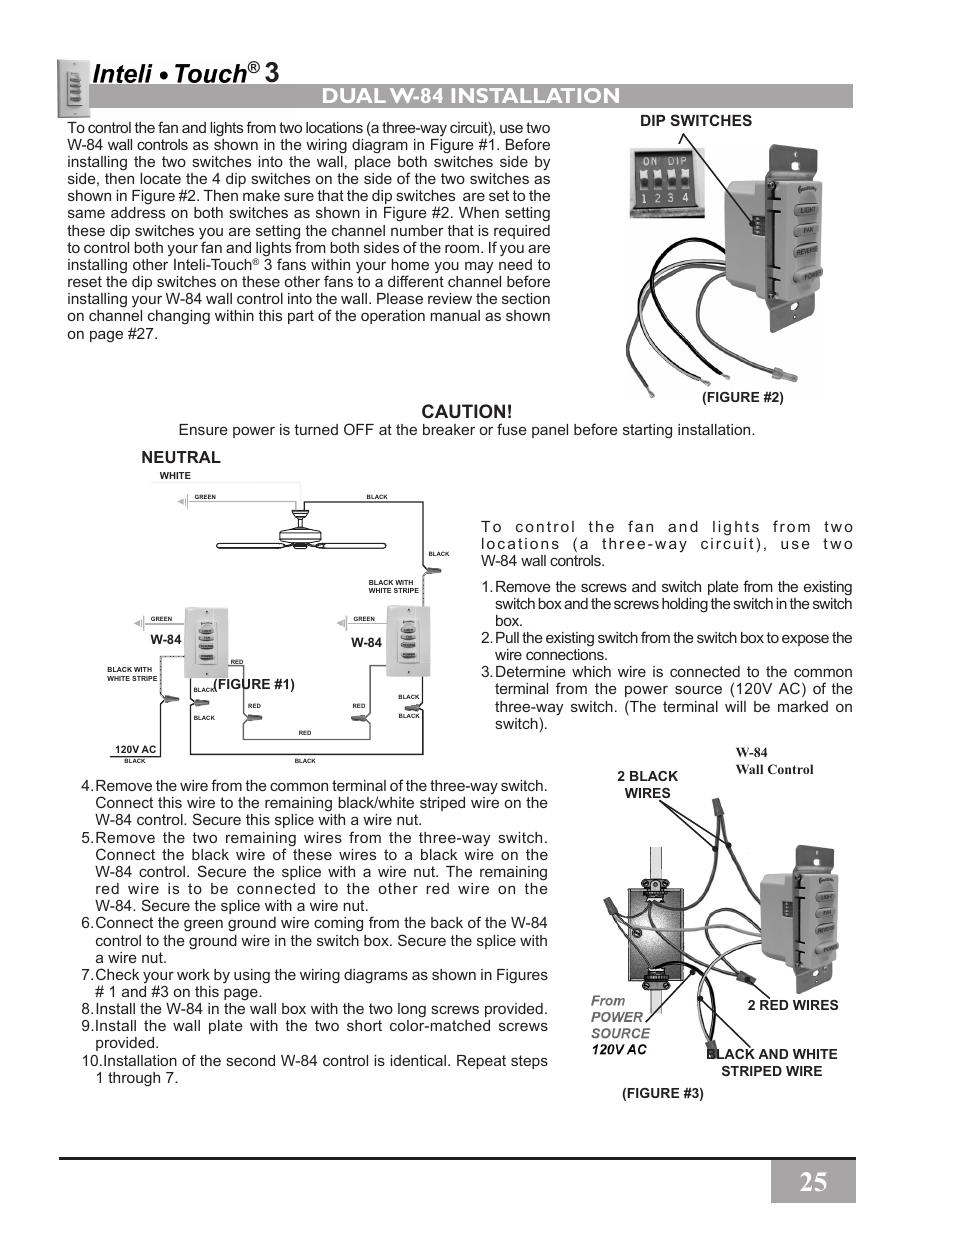 Intellitouch wiring diagram friendship bracelet diagrams